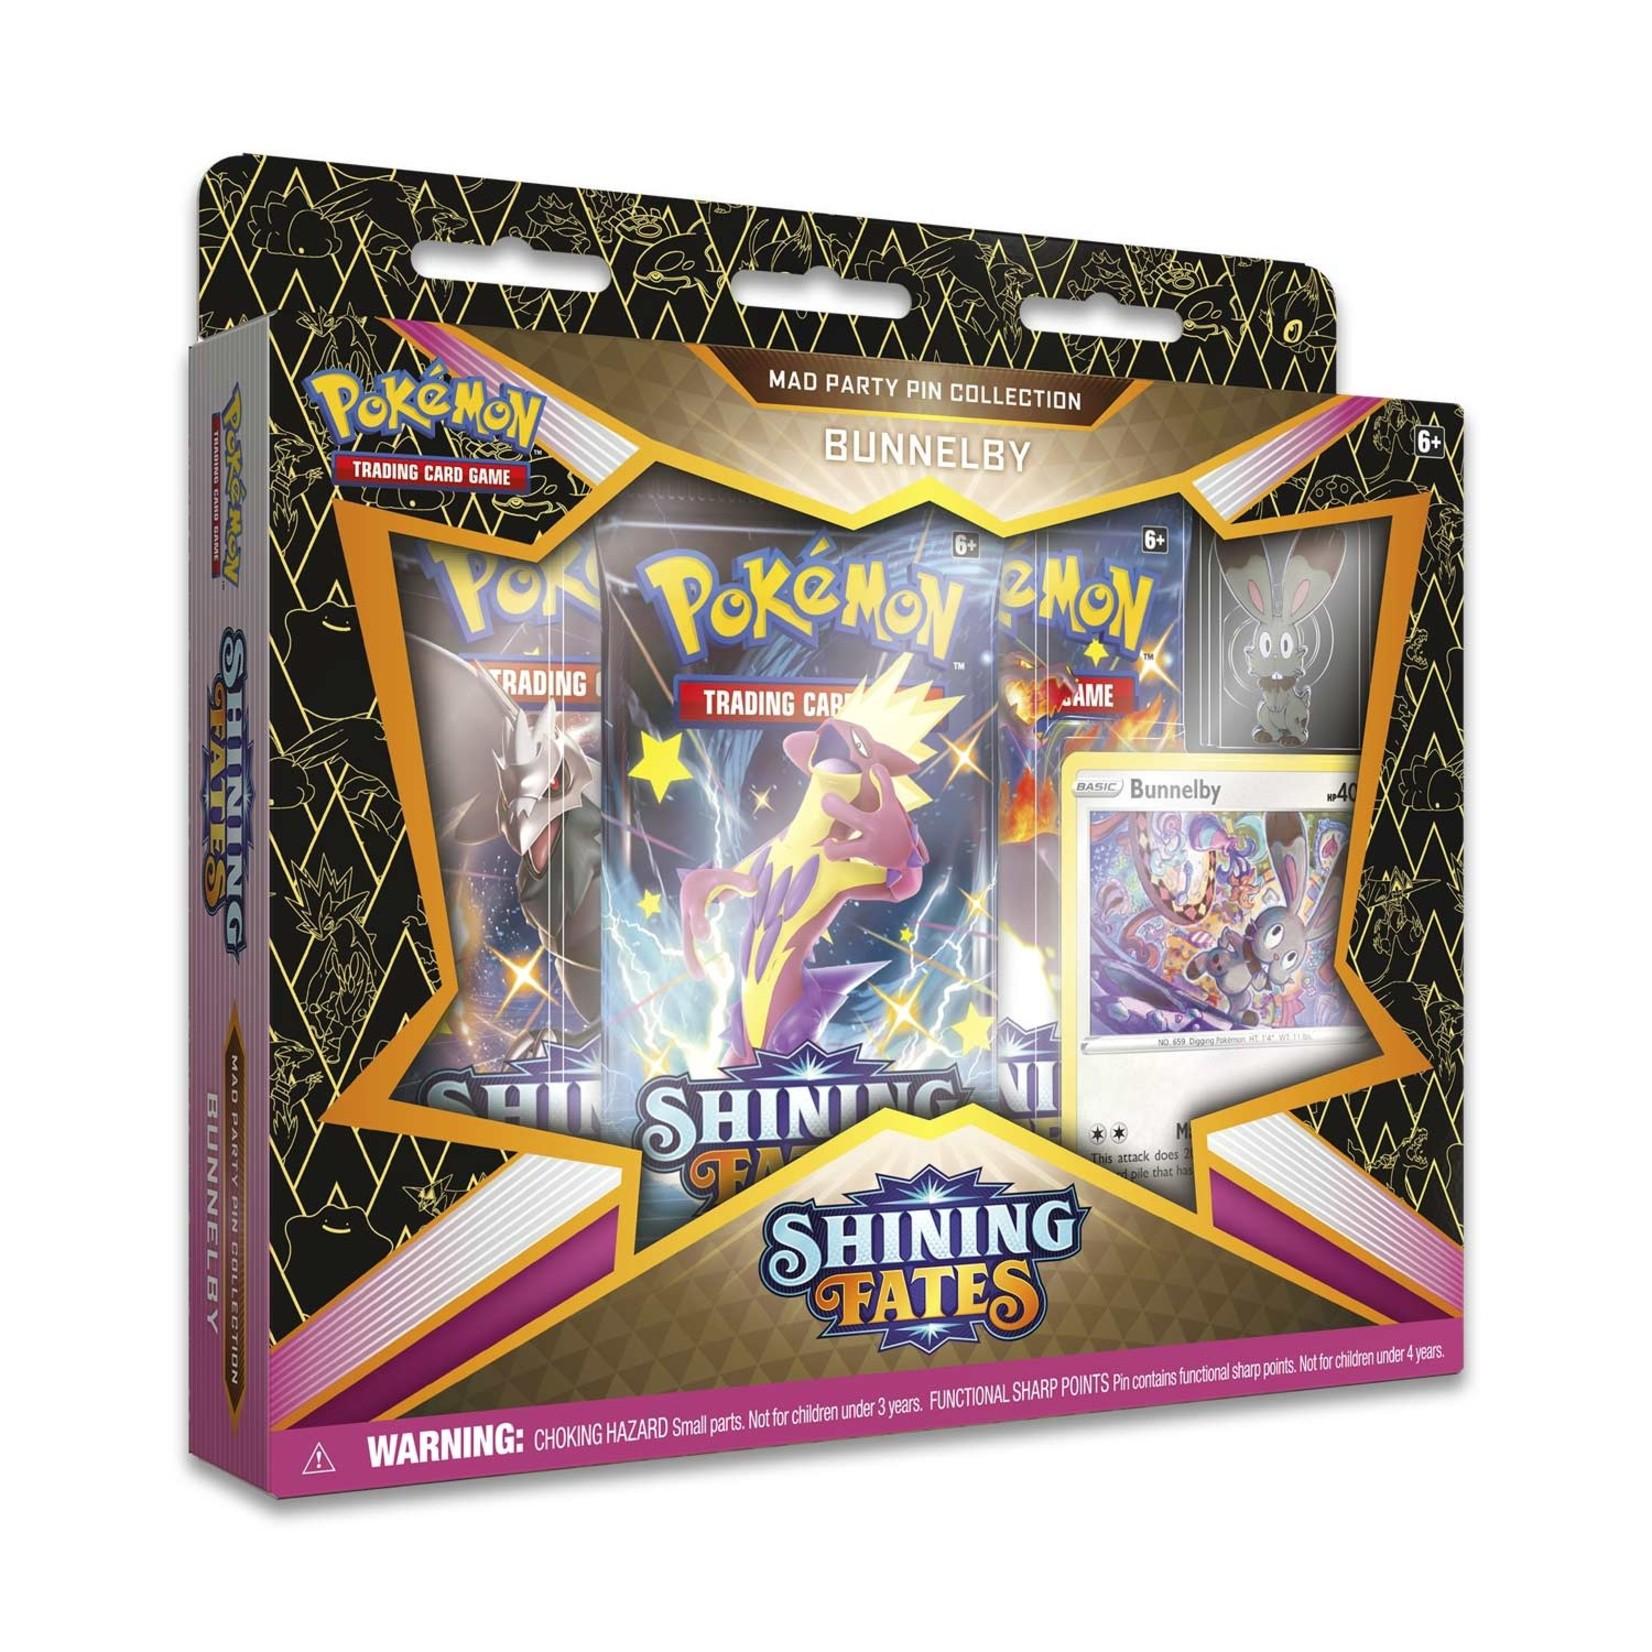 Pokemon International Pokémon TCG: Shining Fates Mad Party Pin Collection (1 of 4)